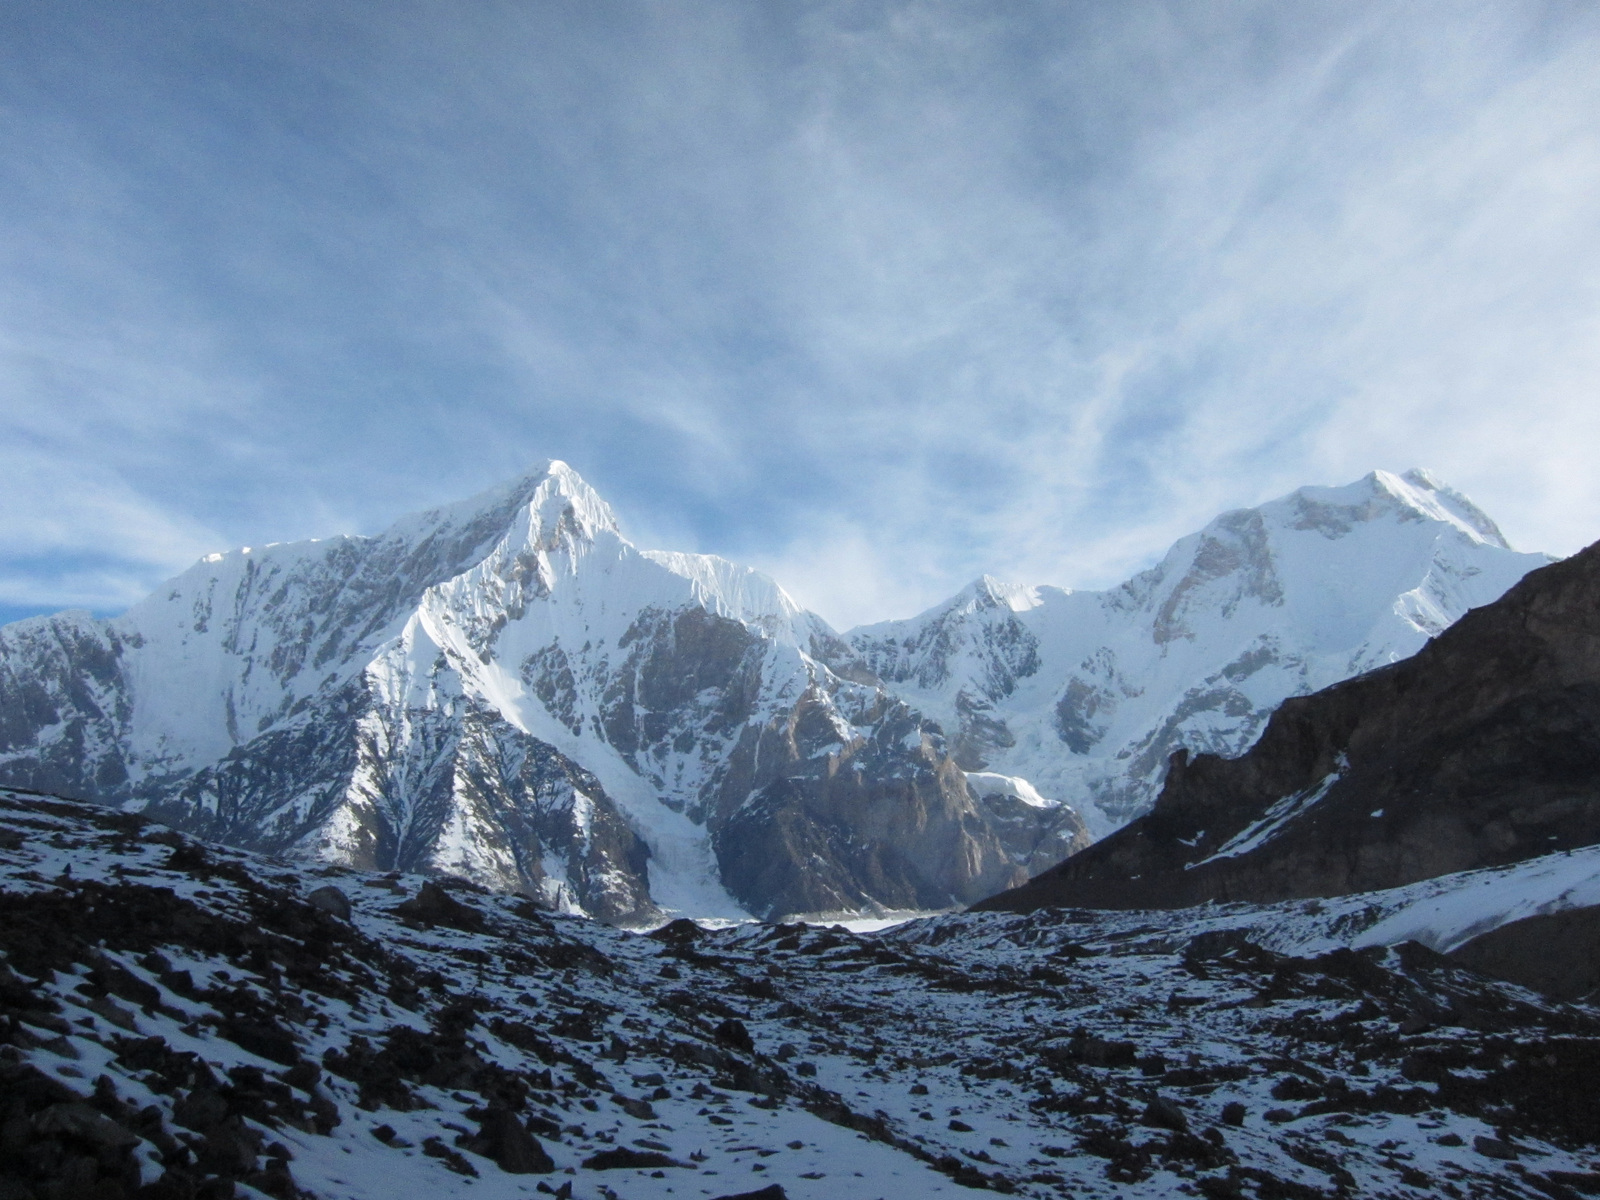 Munku sardyk alpinism. Munku-sardyk - o drumeție tradițională pentru sărbătorile de mai